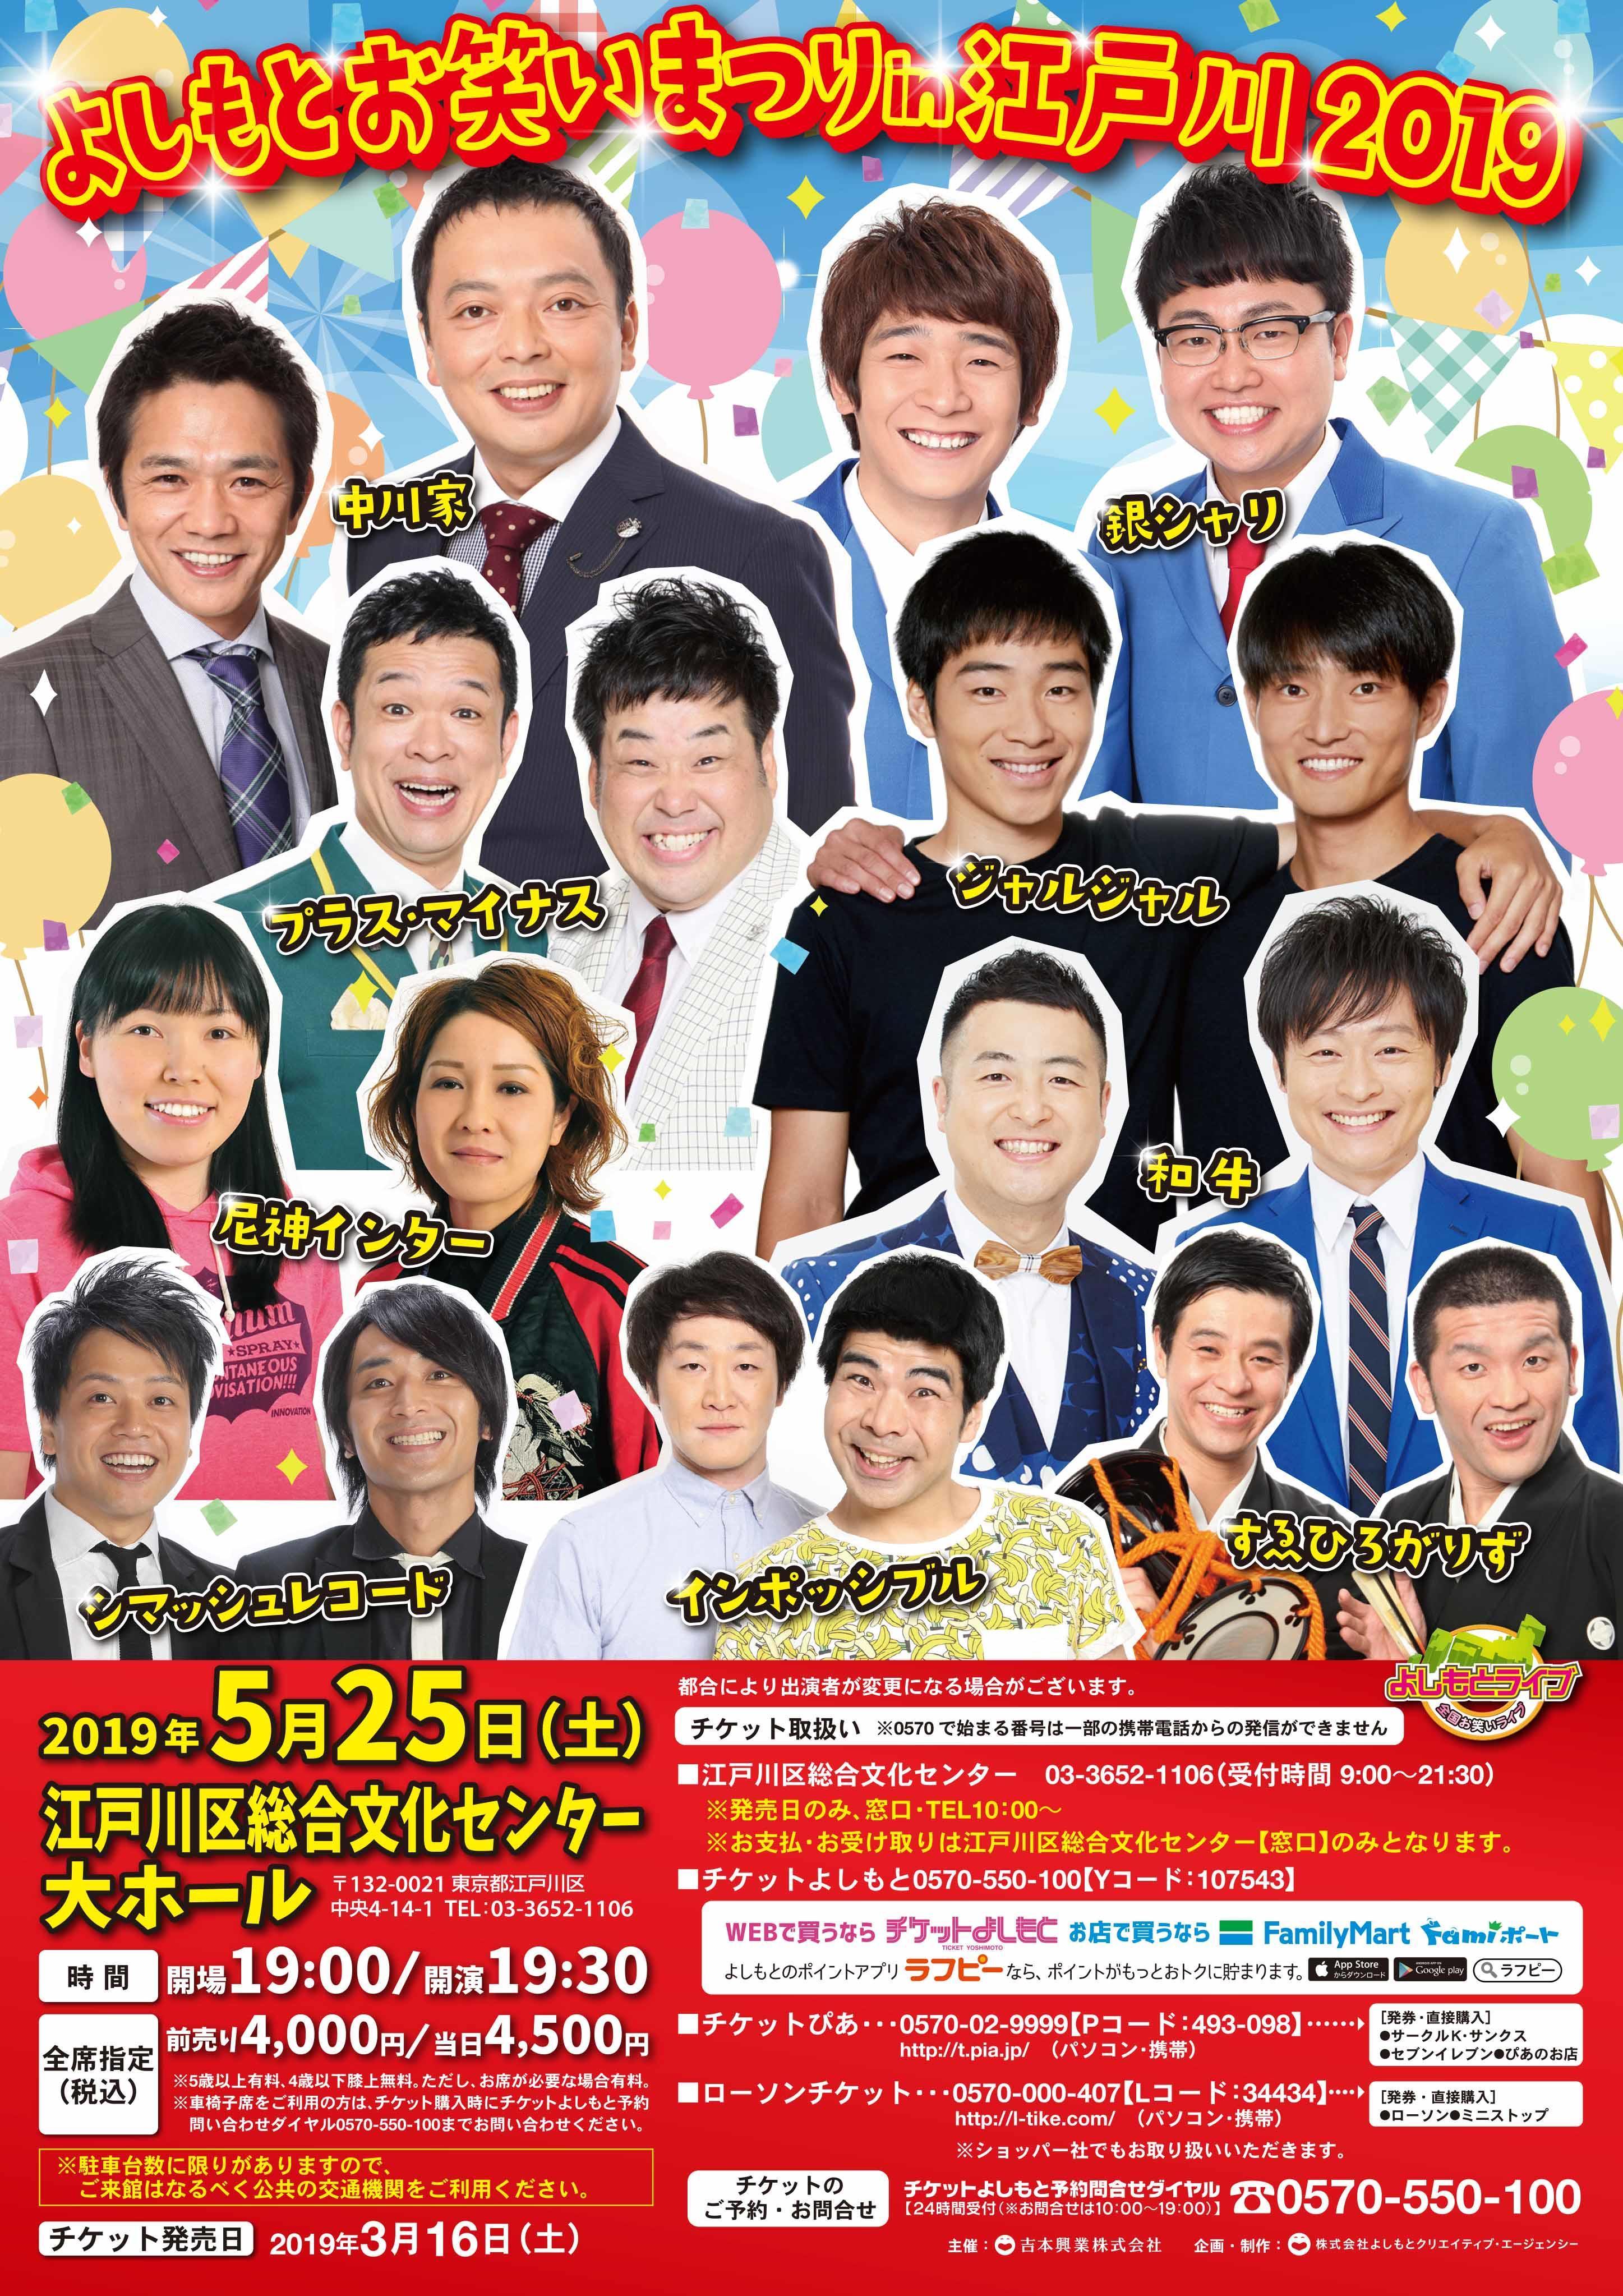 http://www.syumatsu.jp/20190301102912-52e4b4e2574171c7db582450e40a4065c958cab6.jpg